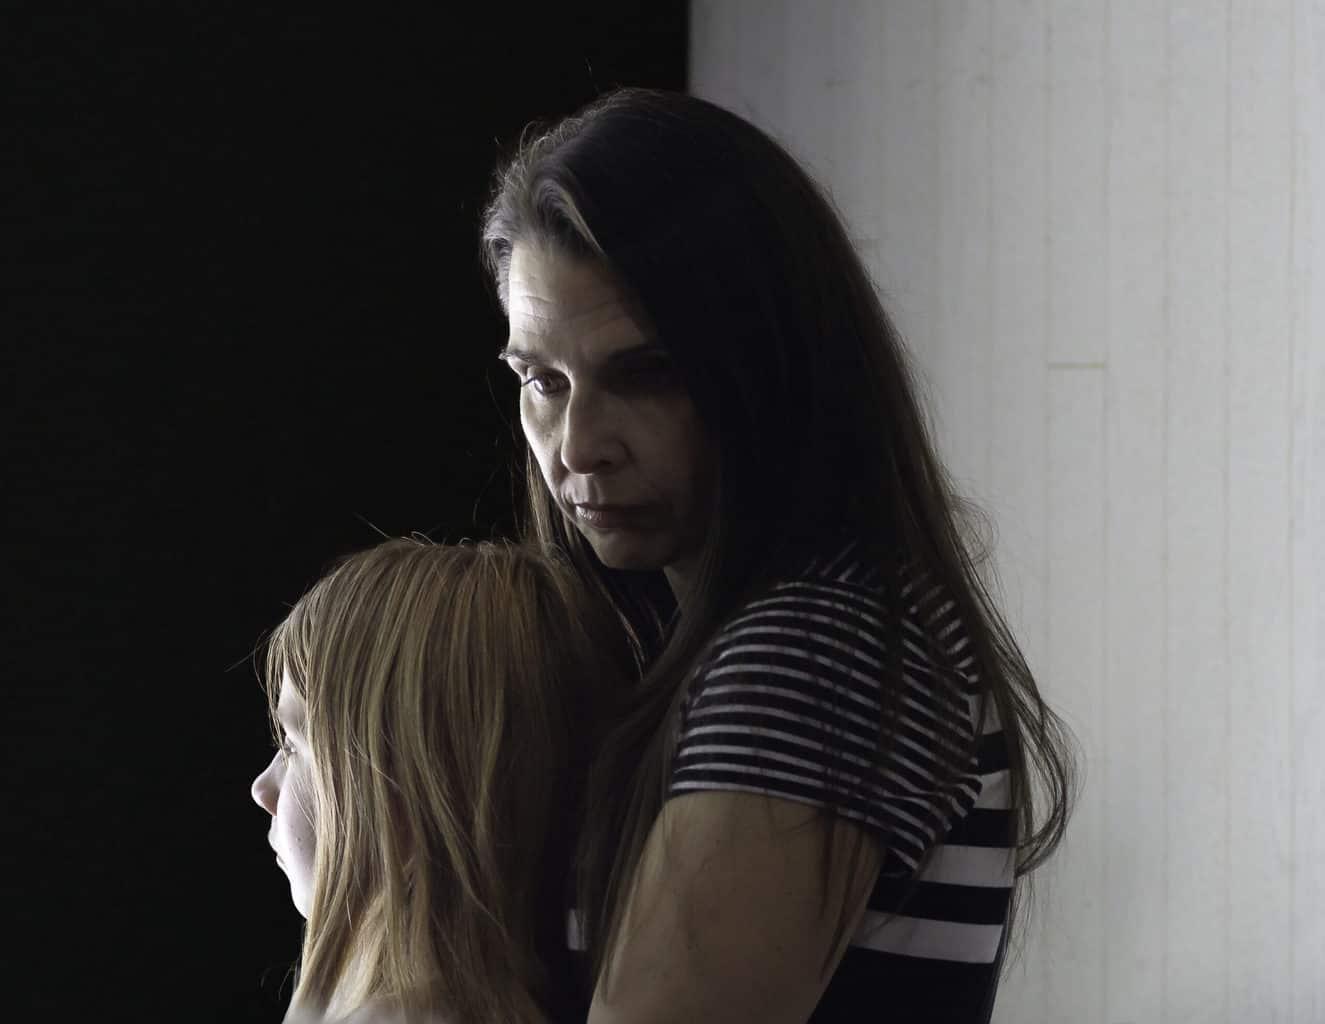 Black MaDonna and Bianca